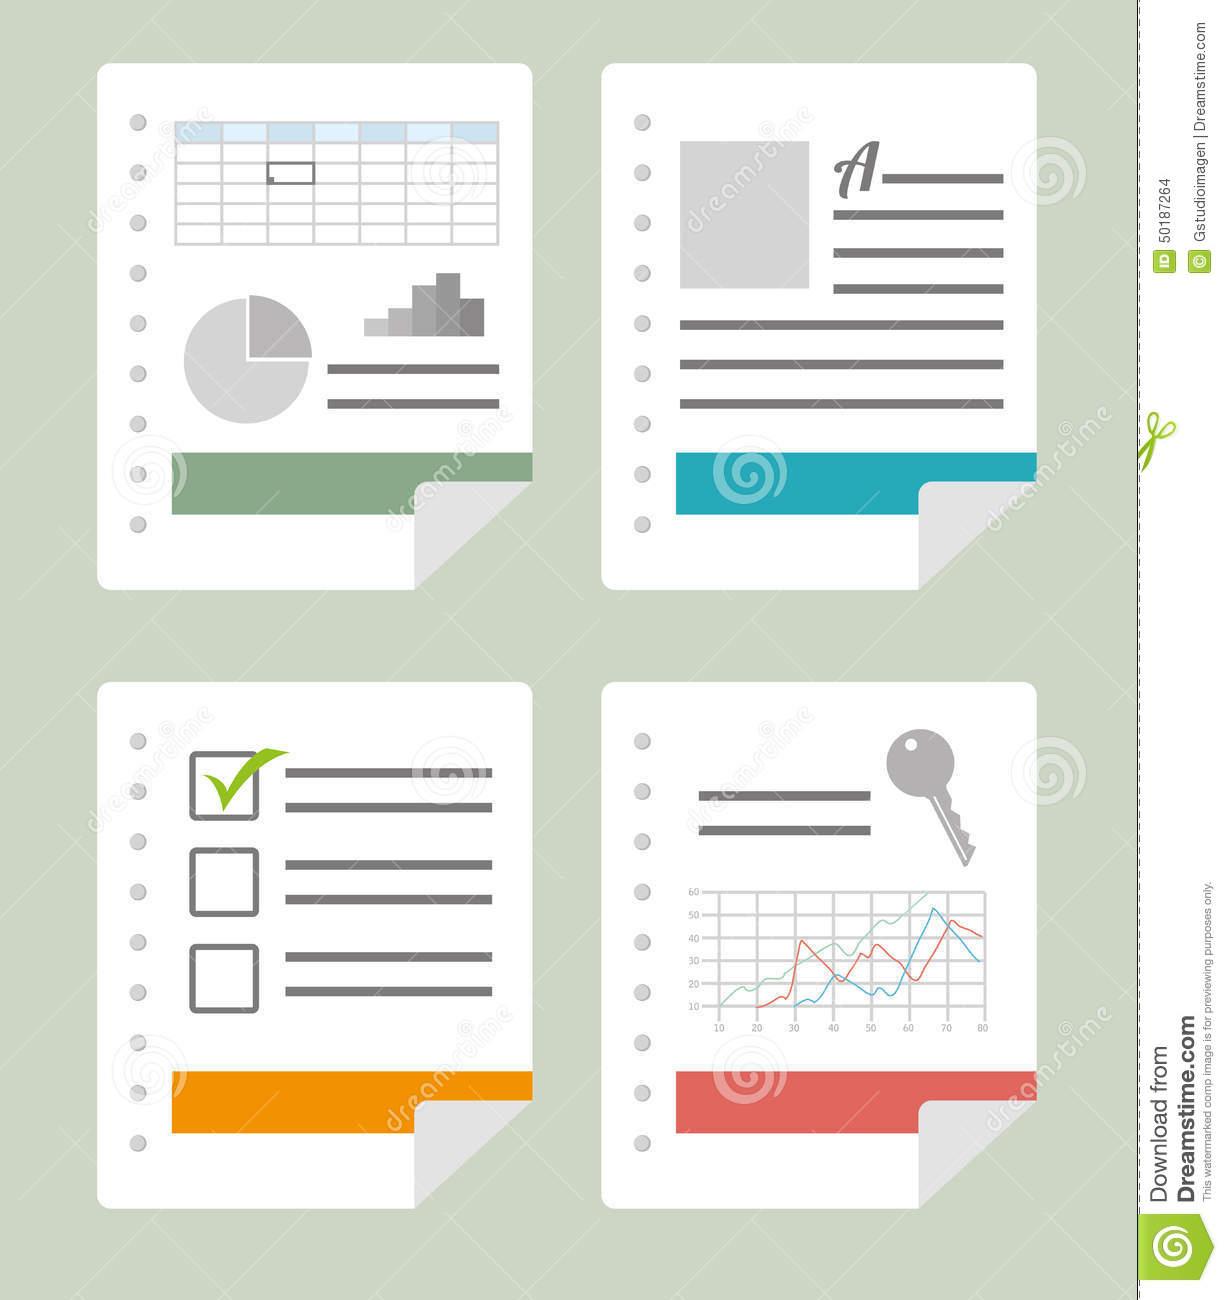 Spreadsheet Graphics In Spreadsheet Design, Vector Illustration. Stock Vector  Illustration